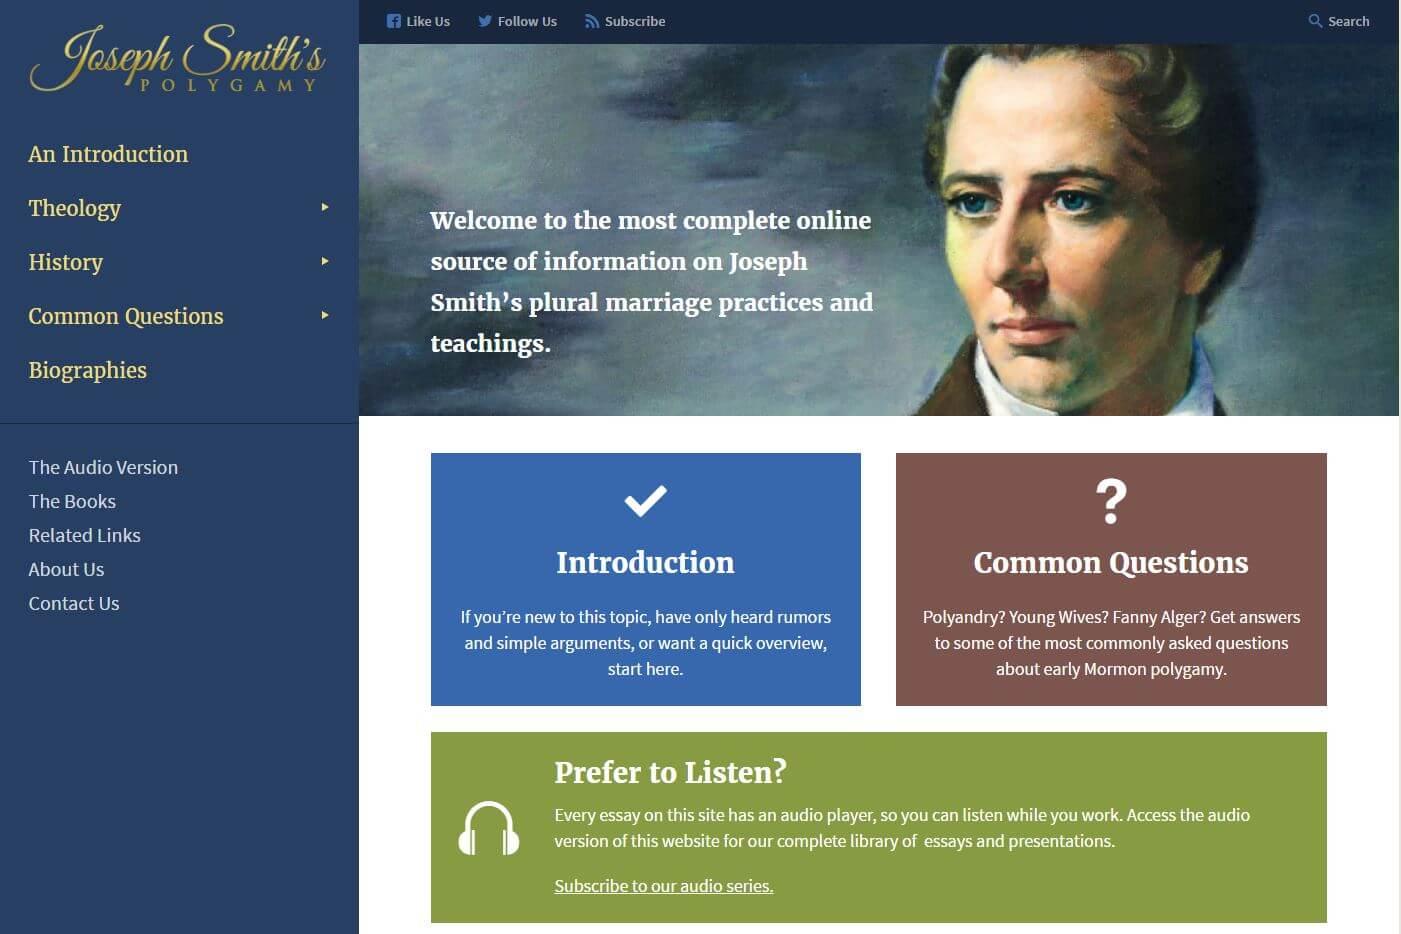 polygamy essay urx gun control essay against polygamy  welcome mormon polygamy documents joseph smith s polygamy website